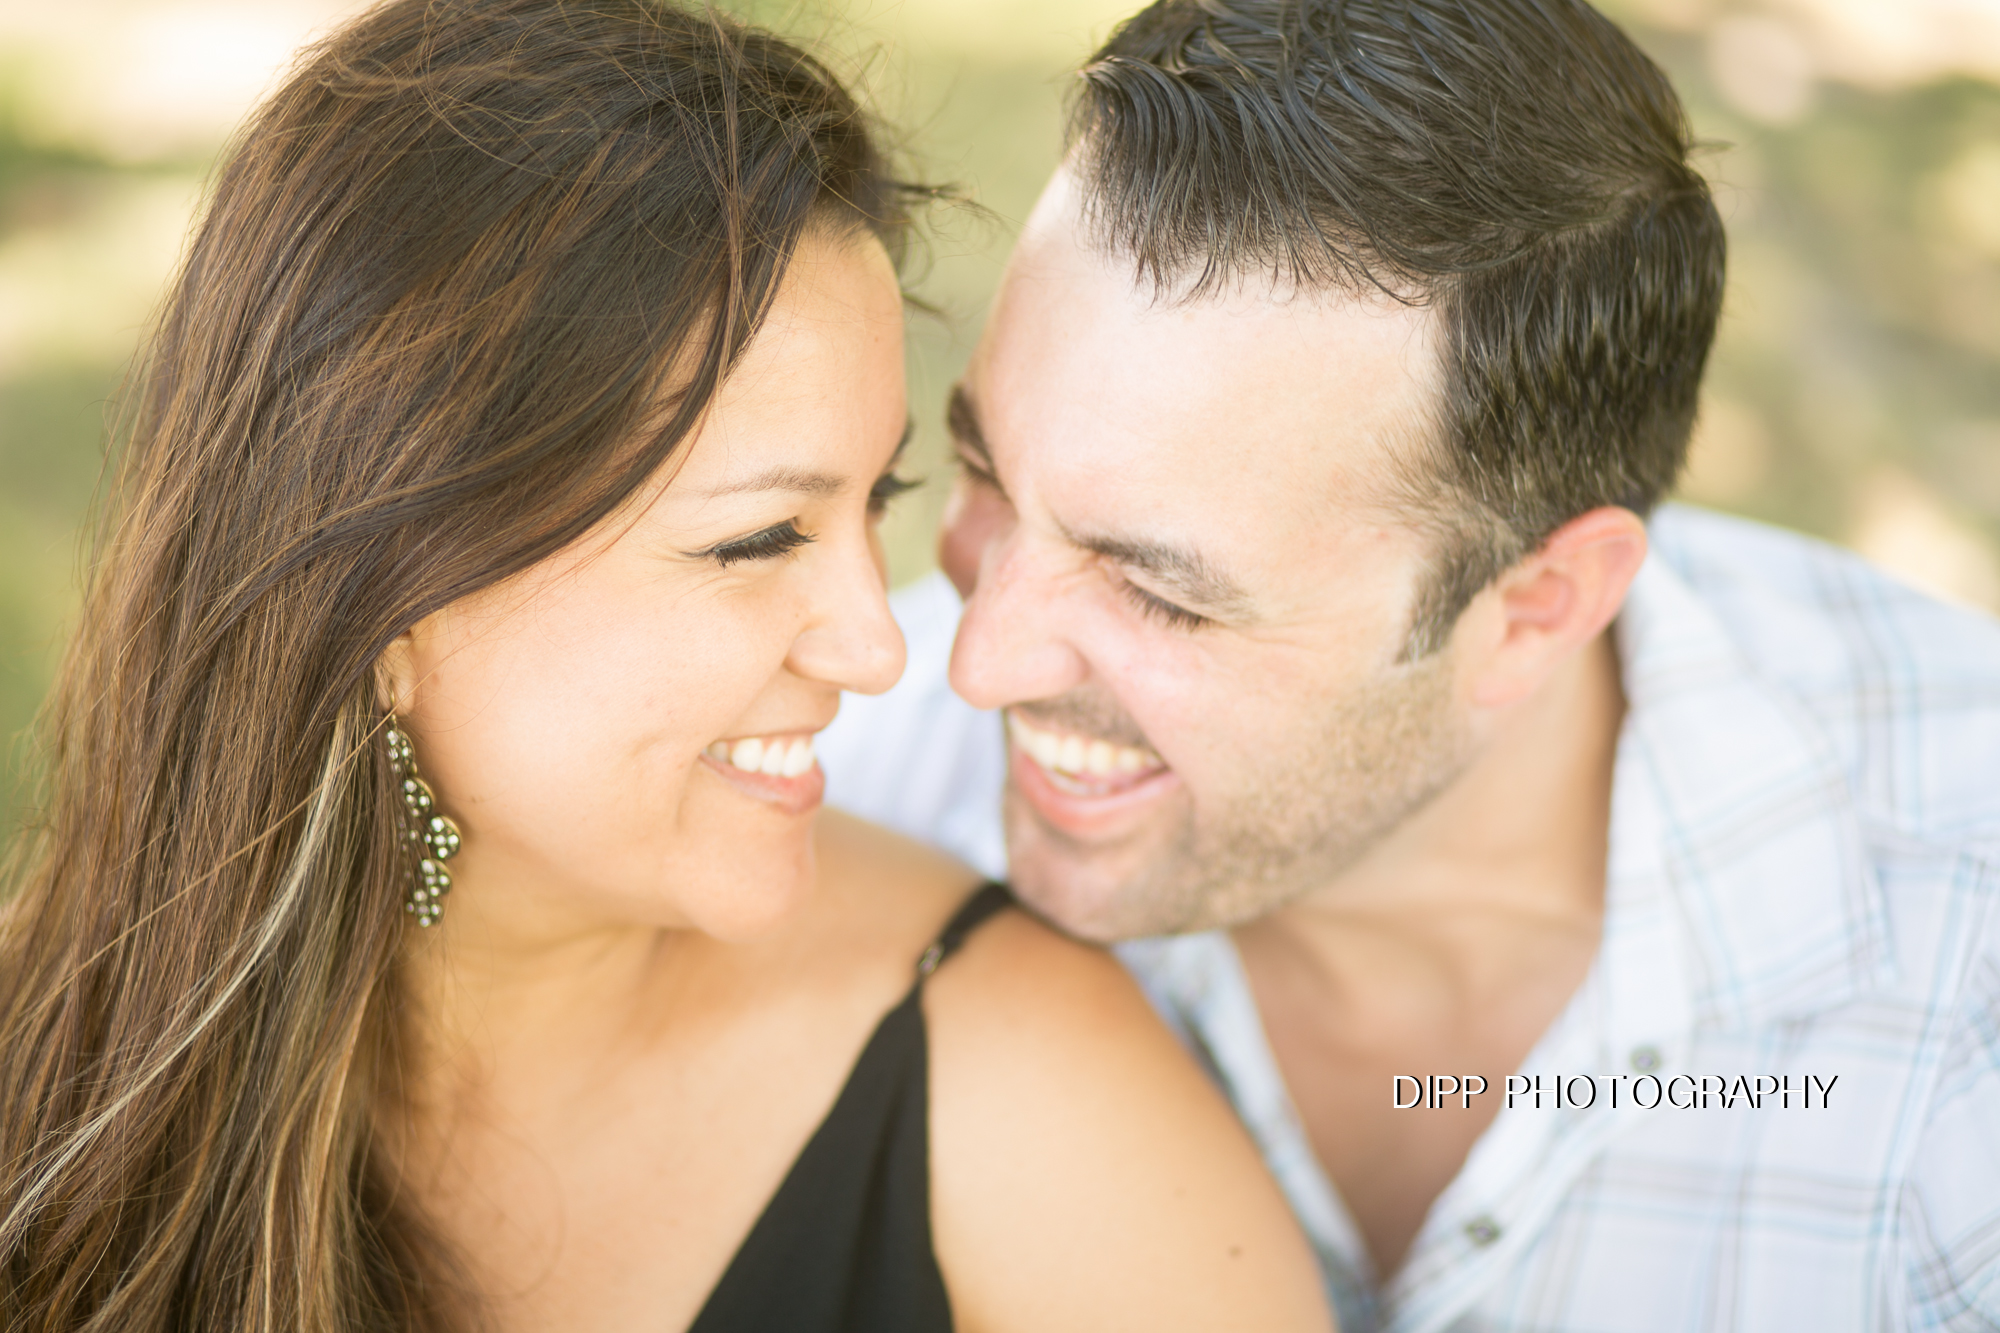 Dipp_2016 Brandon & Sara Mini Engagement Session-236